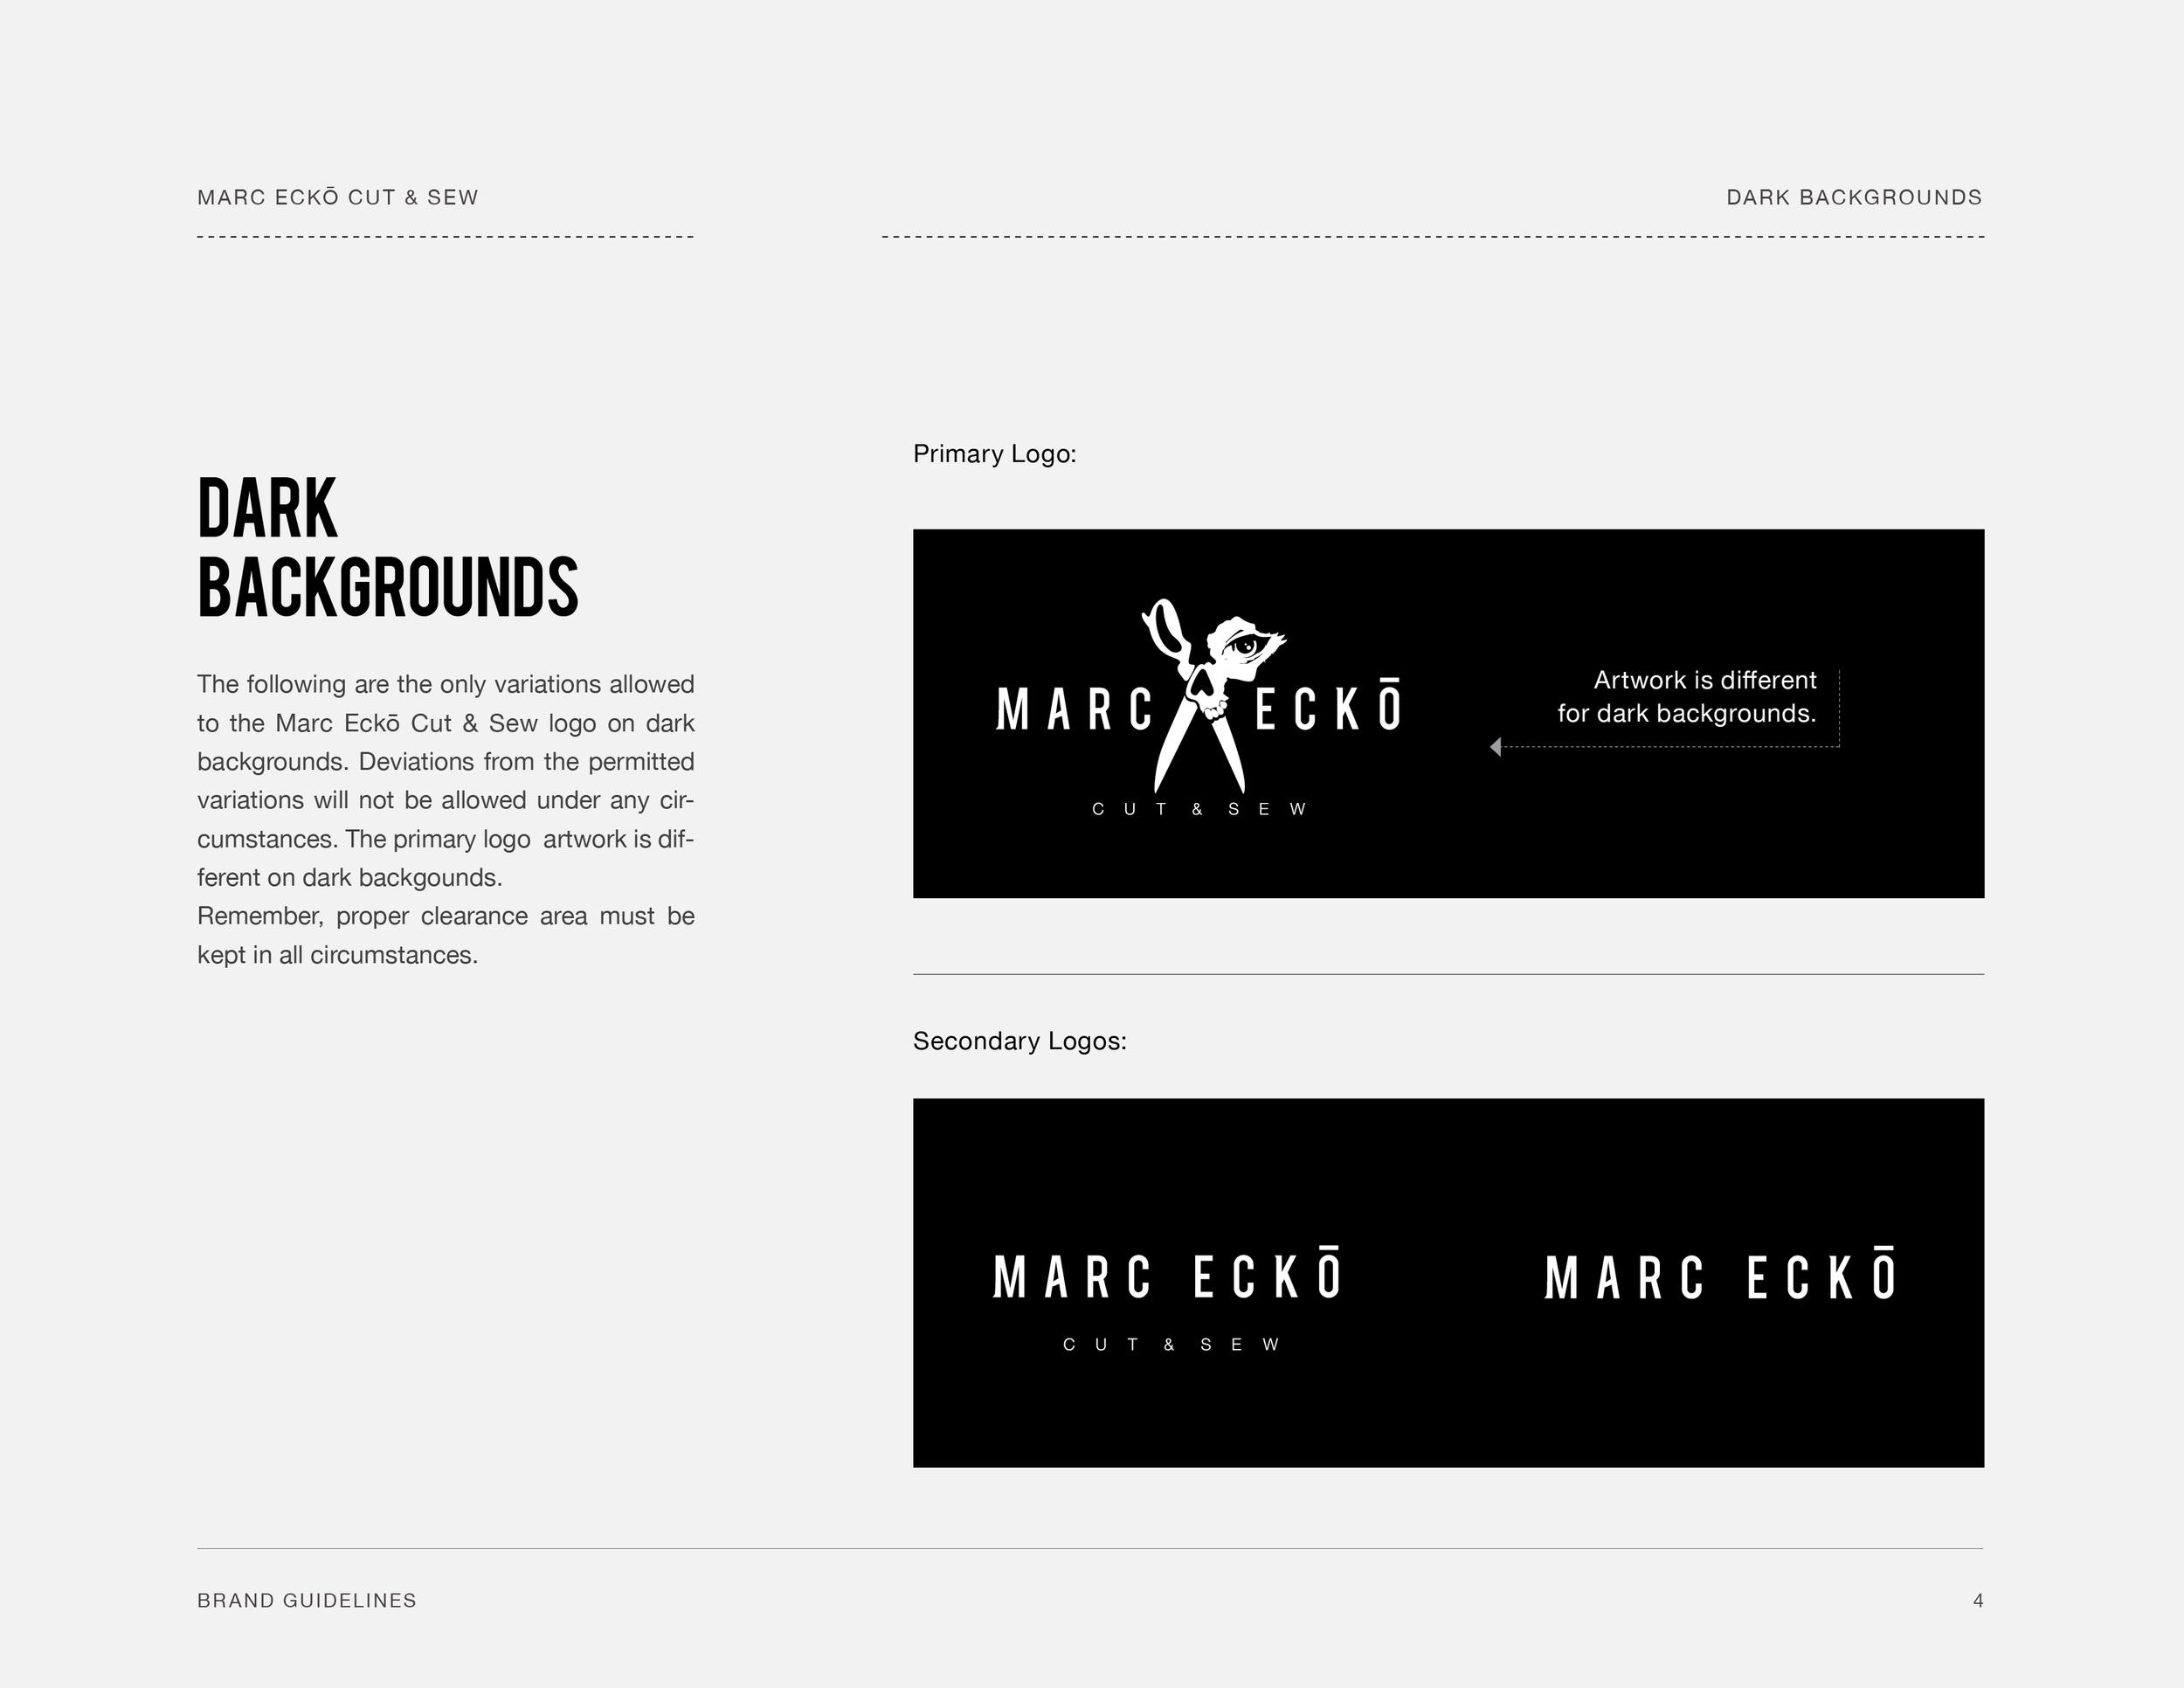 Marc-Ecko-brand-guidelines7.jpg